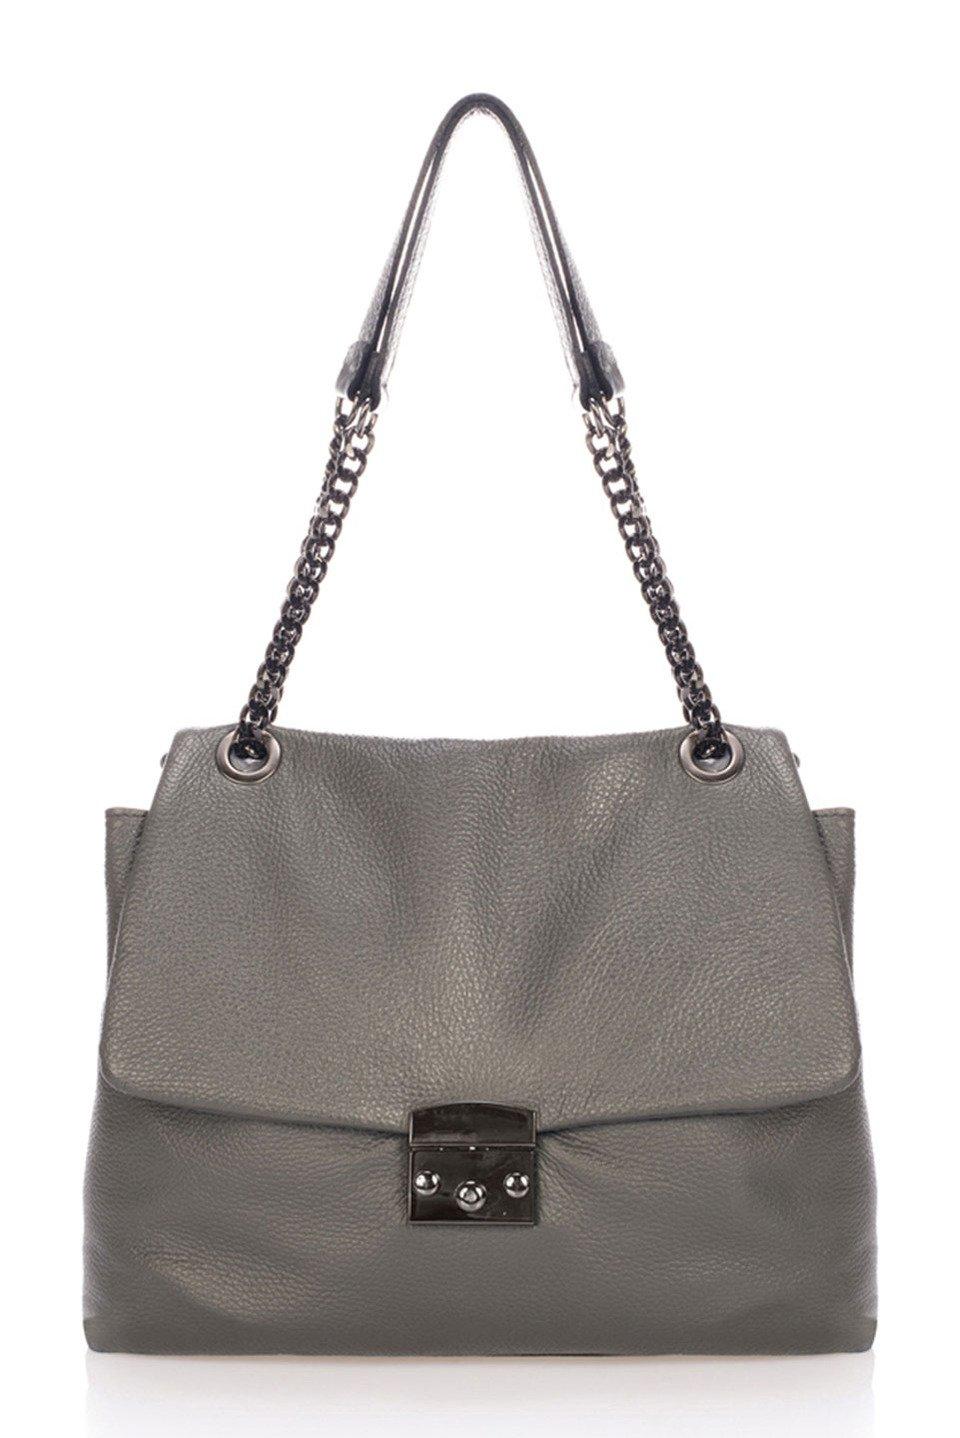 Coco Top Handle in Gray